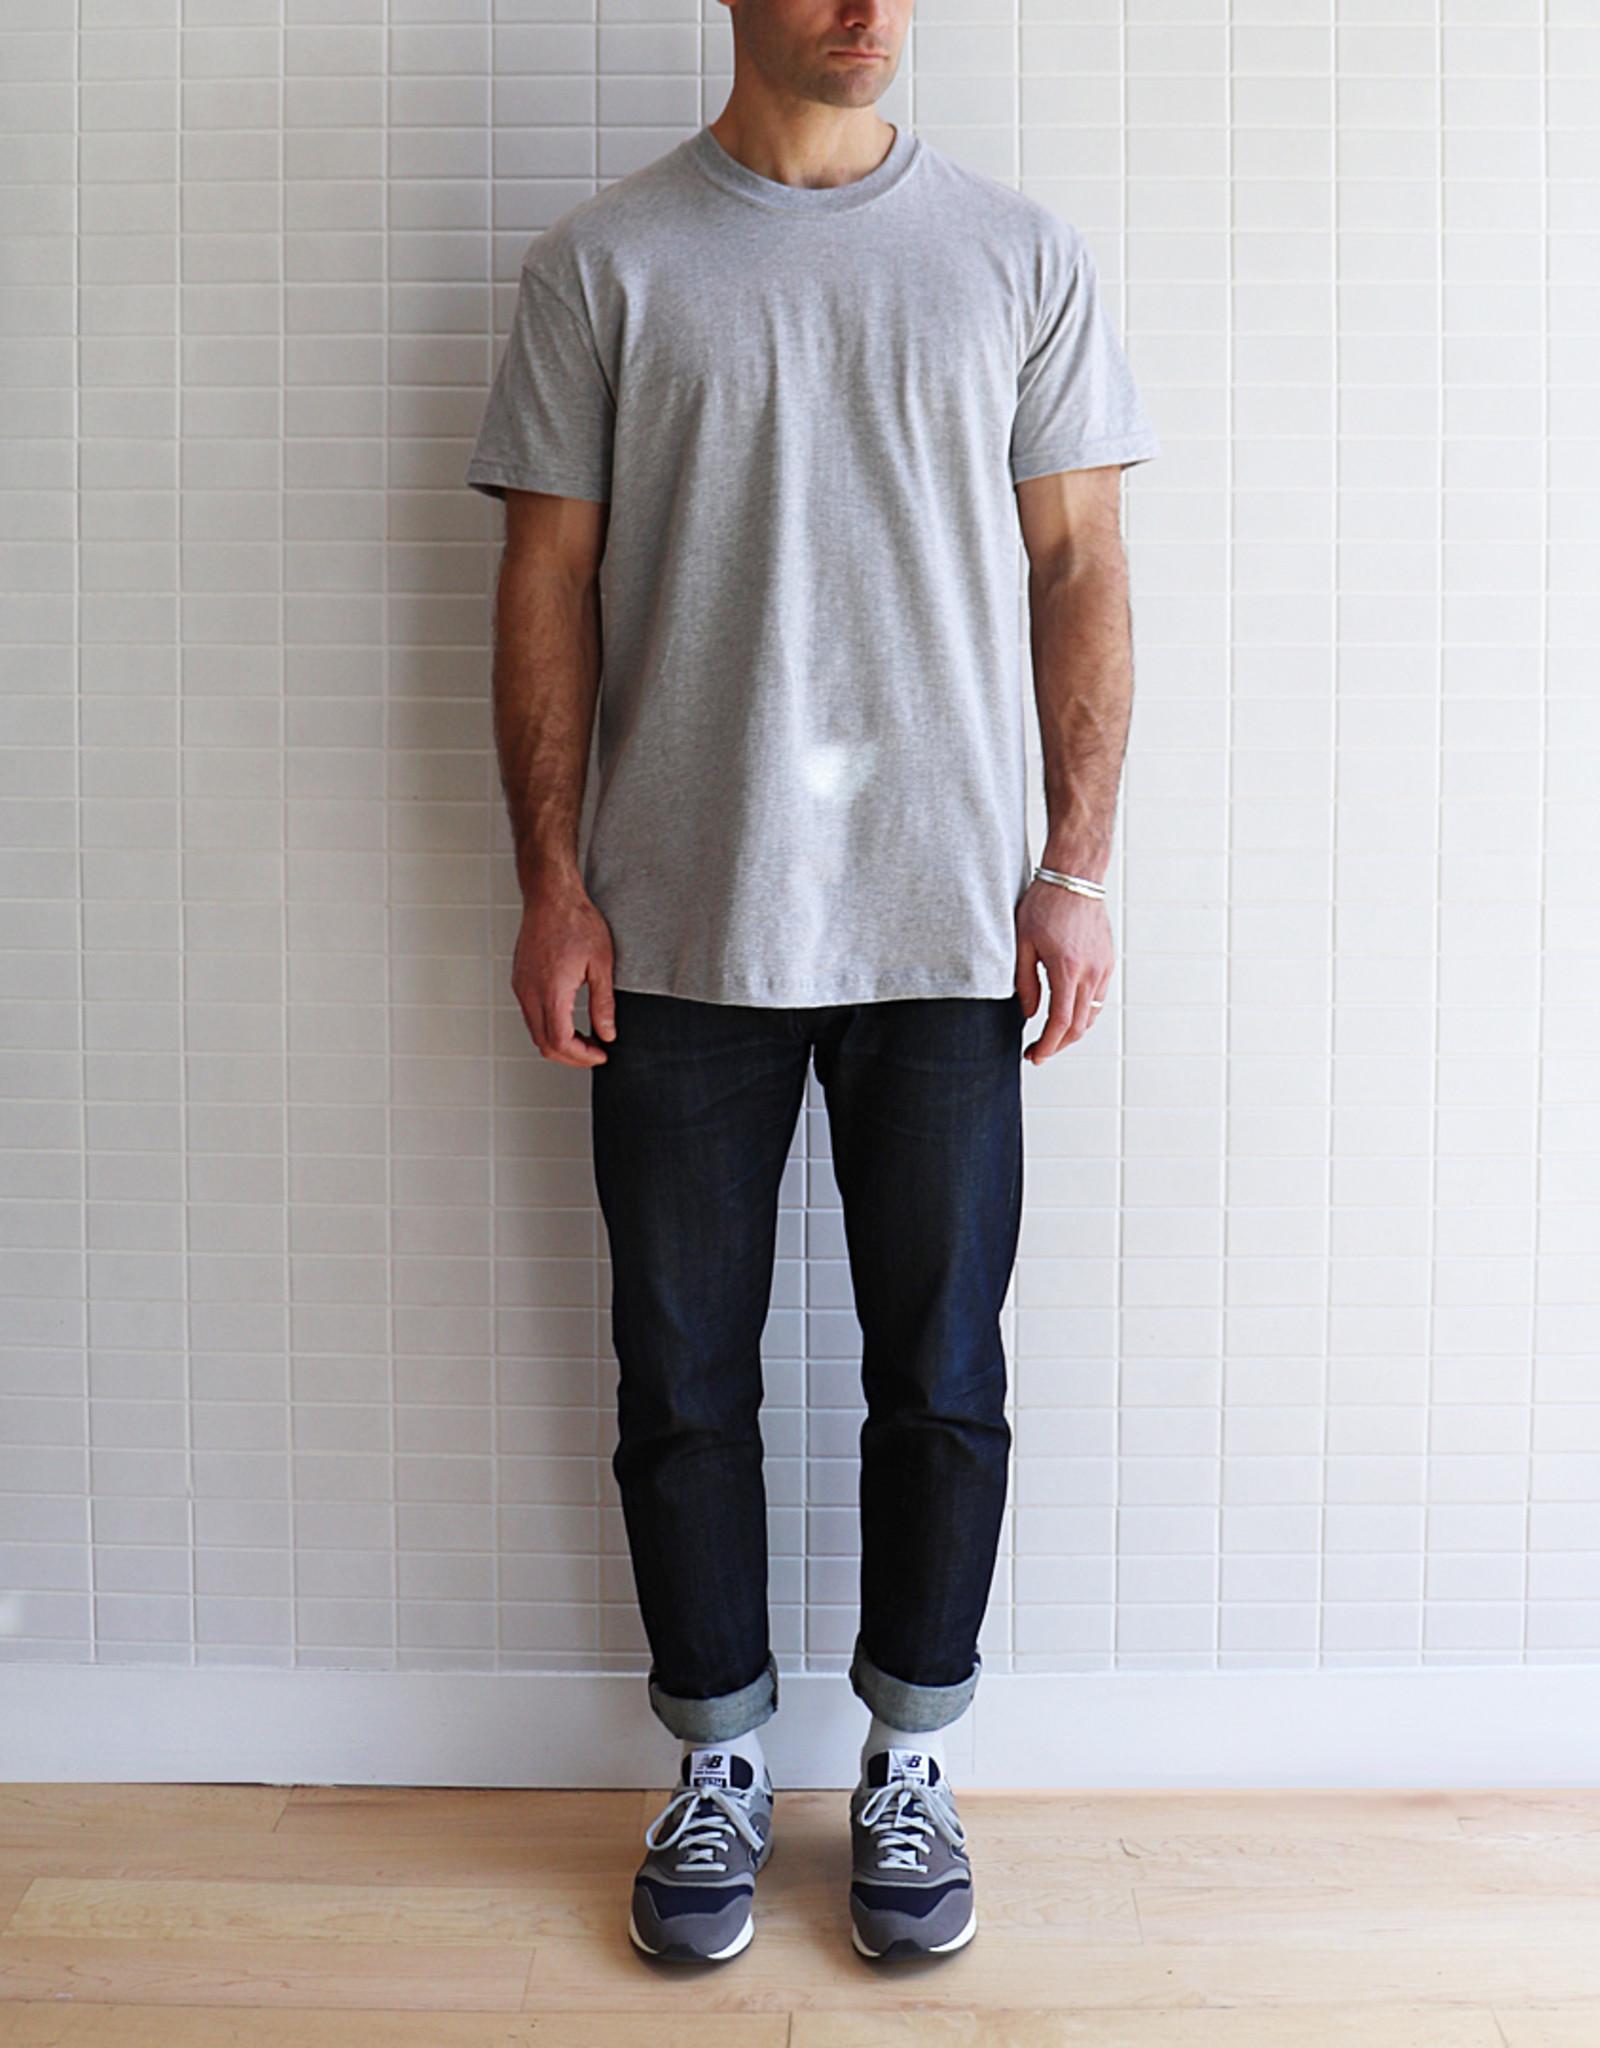 Naked & Famous - Circular Knit T-Shirt - Gris Chiné